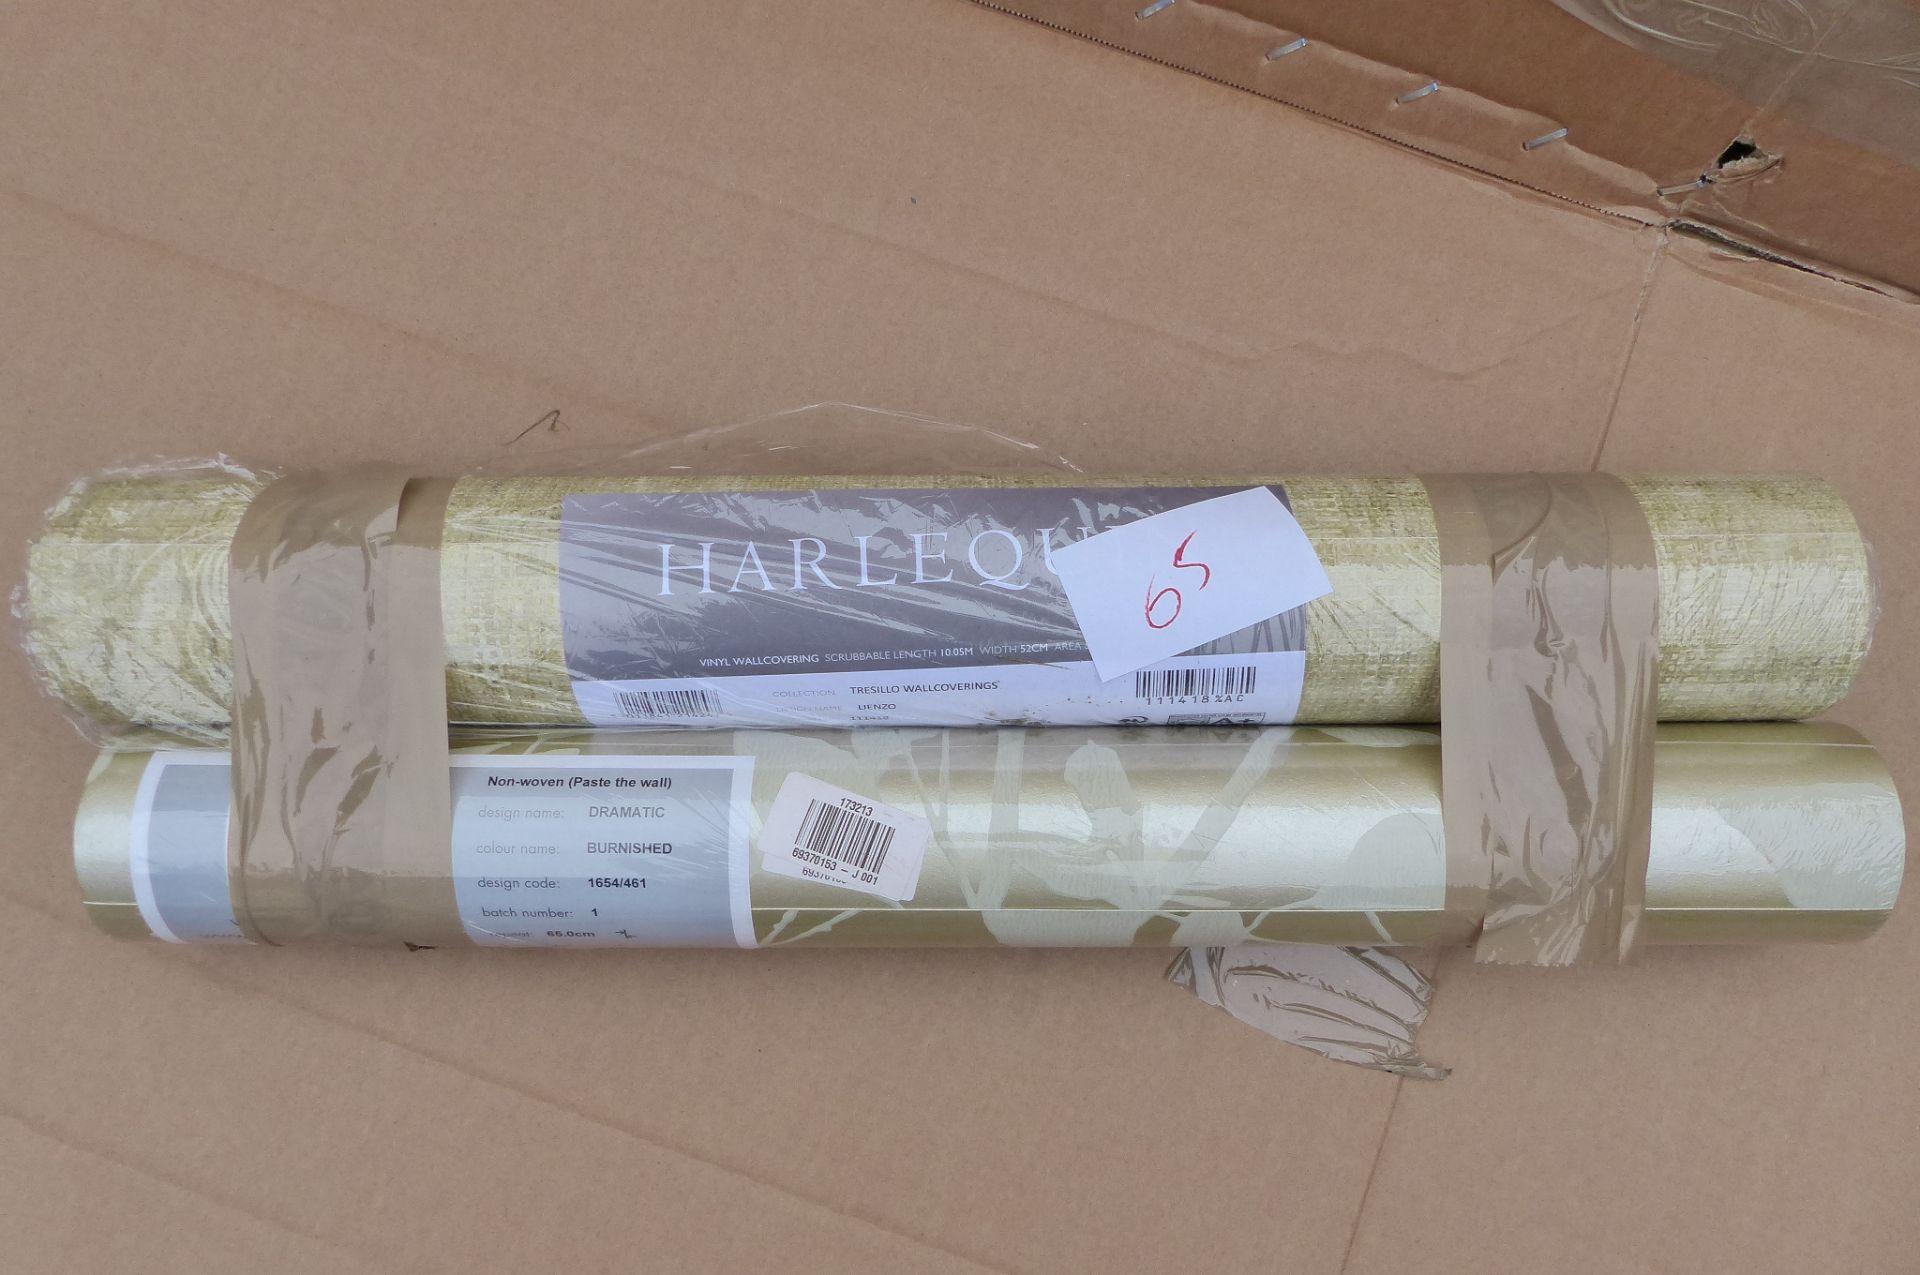 2 Rolls of wallpaper Harlequin & Prestigious Textiles